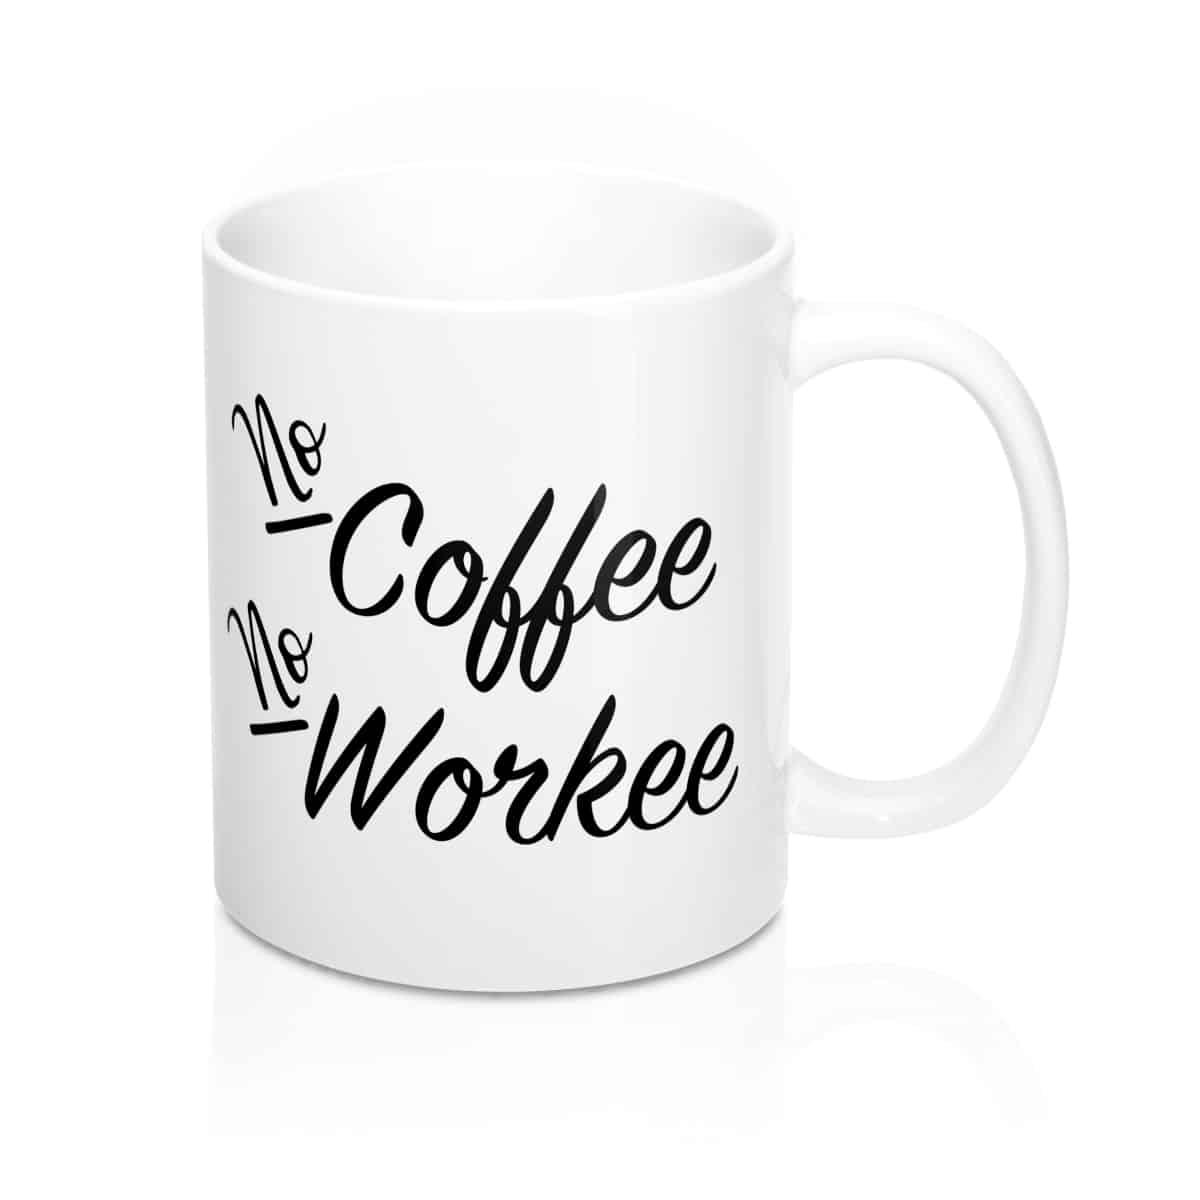 No Coffee No Workee - Funny Quote Mug For Entrepreneurs ...